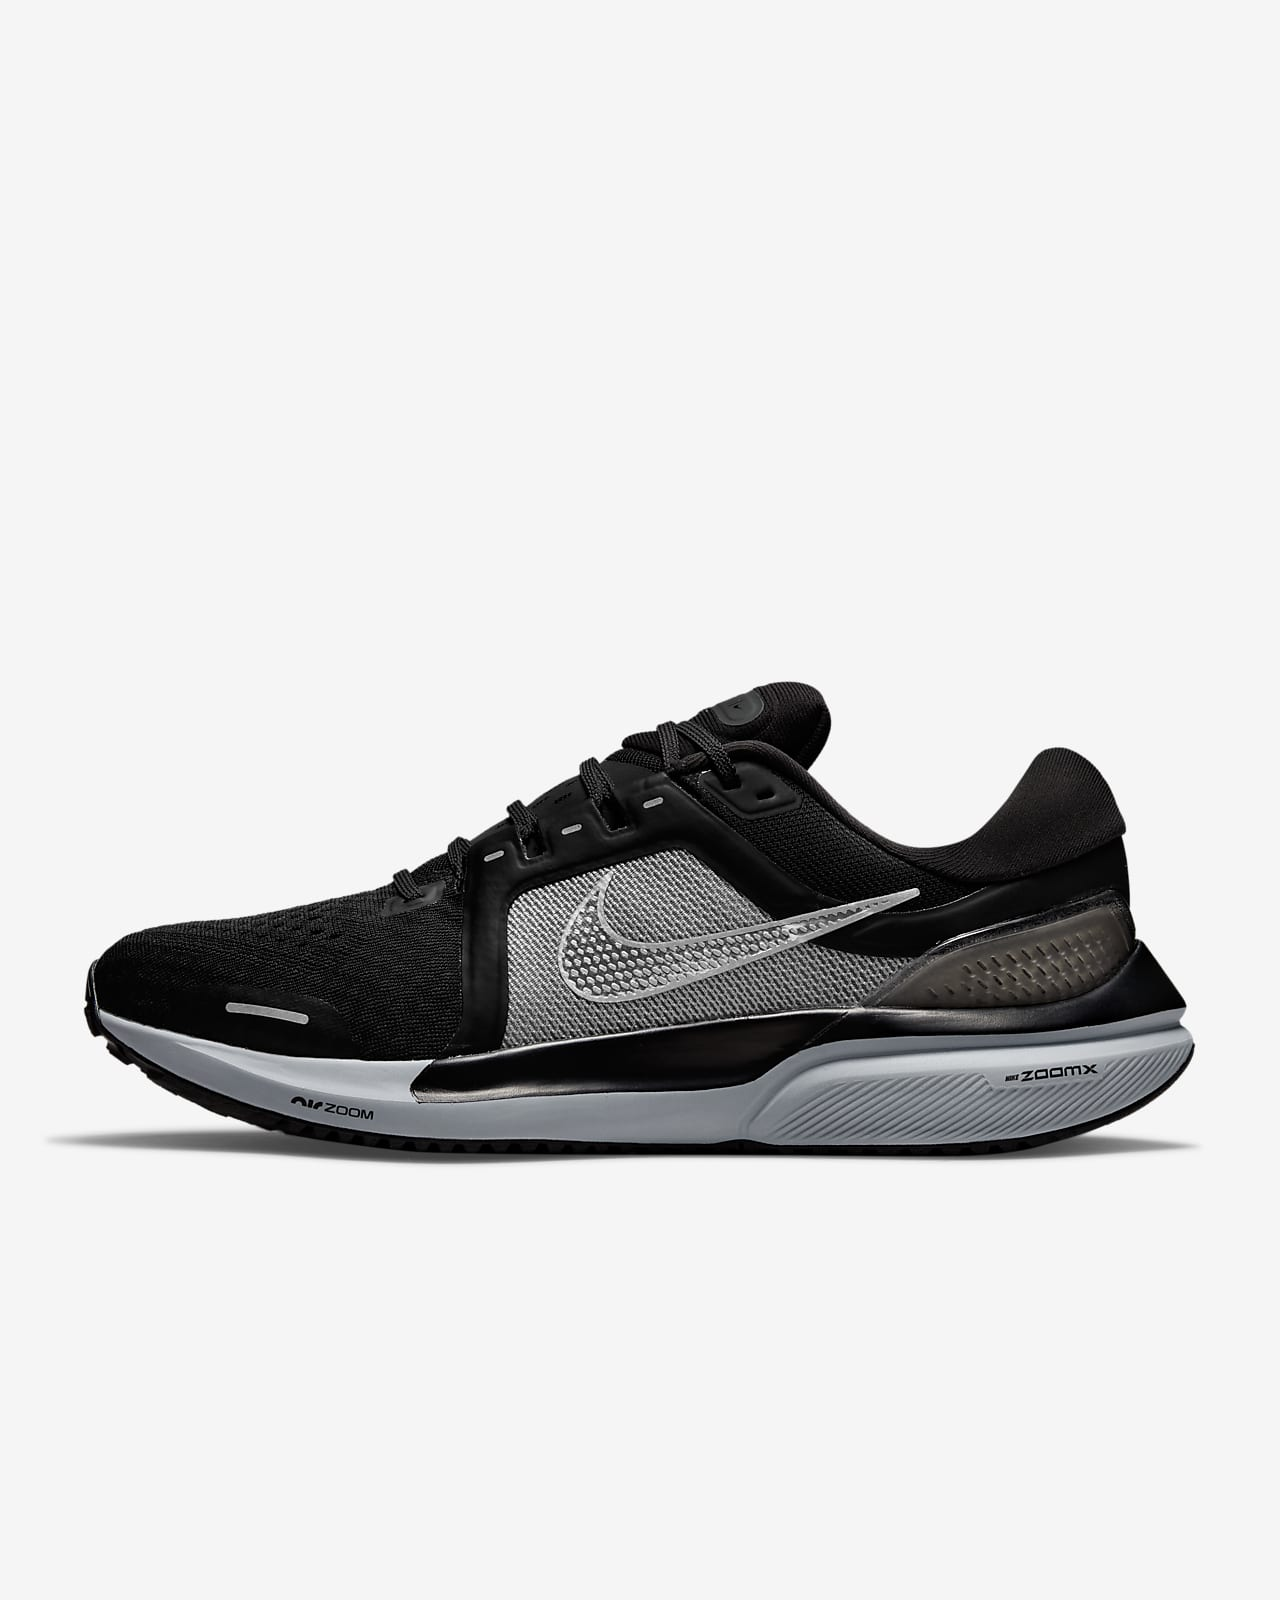 Chaussures de running sur route Nike Air Zoom Vomero 16 pour Homme